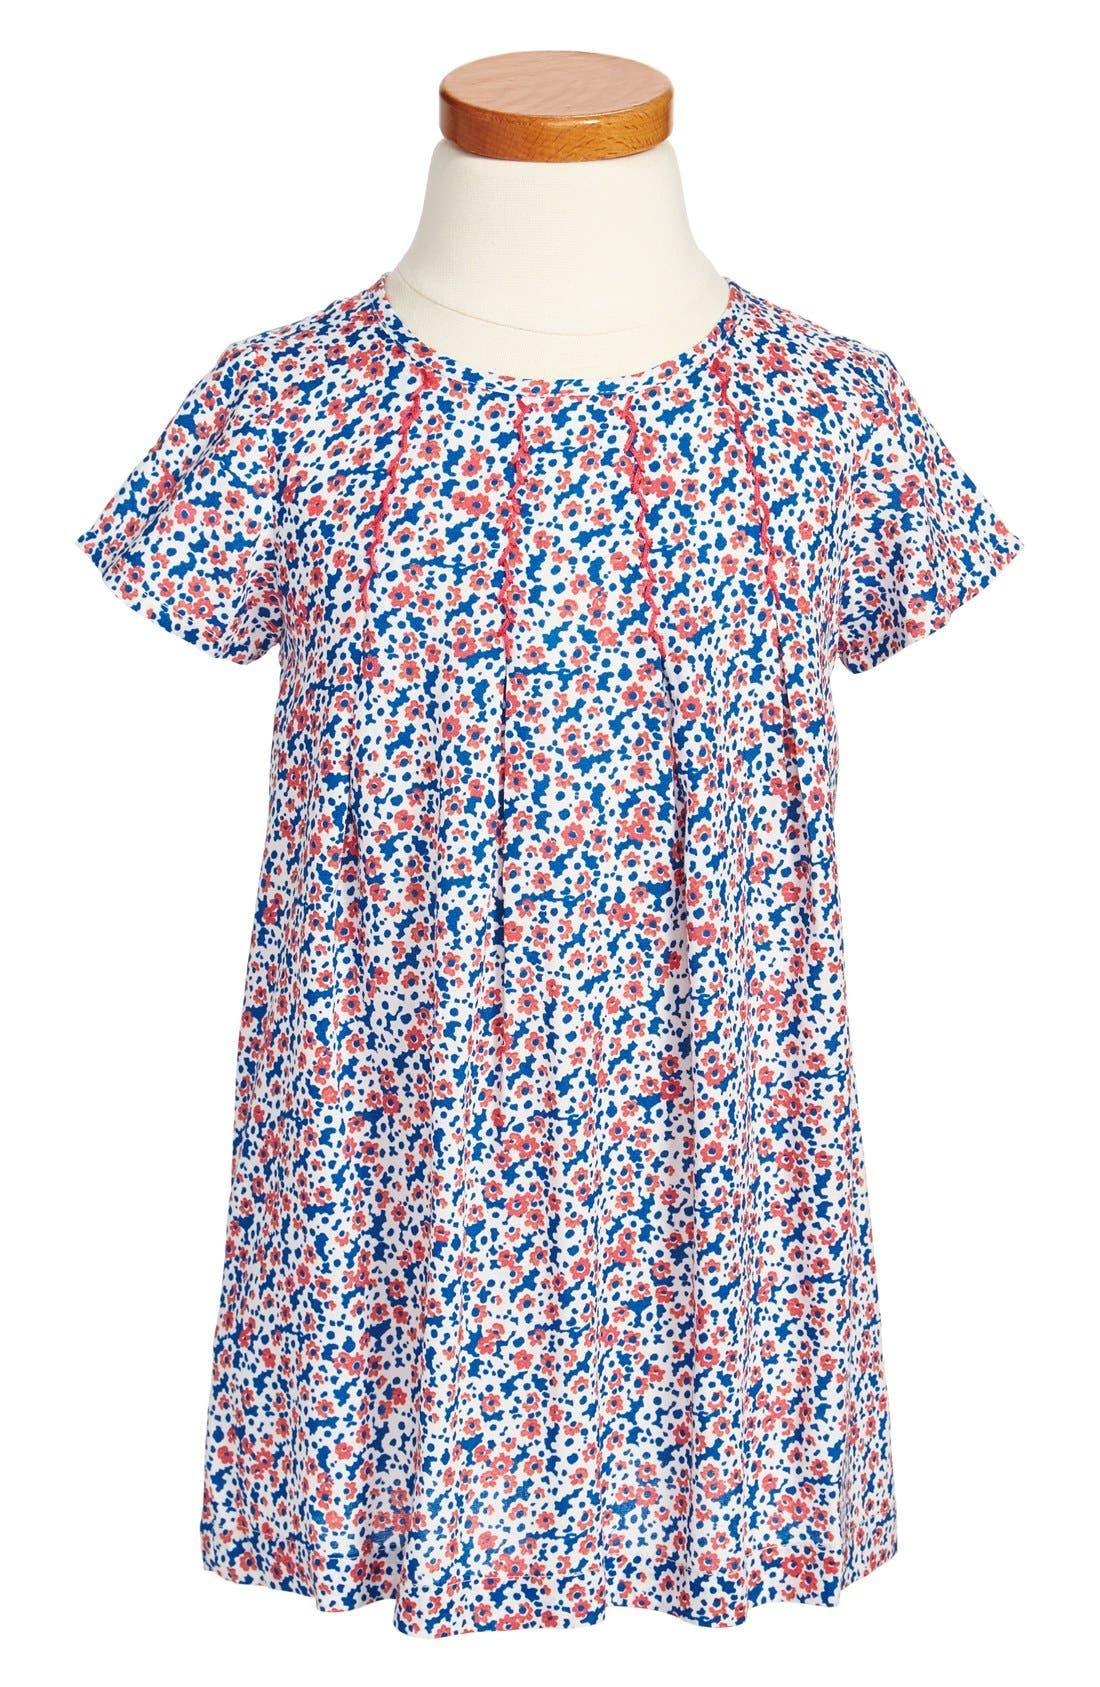 Main Image - Tucker + Tate 'Patricia' Pleated Print Dress (Little Girls & Big Girls)